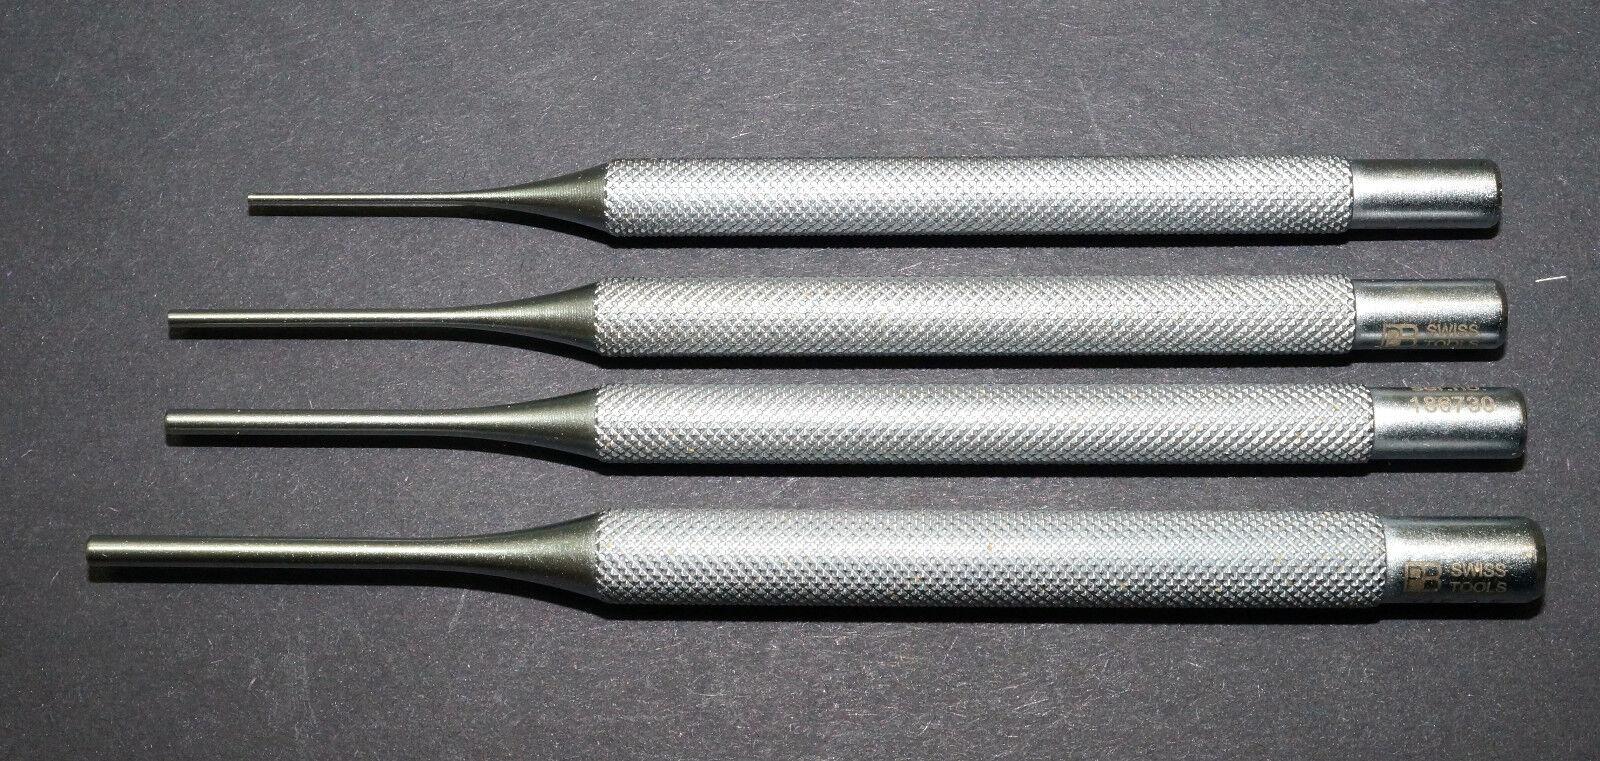 PB SWISS TOOLS 715 kleine Splinttreiber Durchtreiber Splintentreiber 4-tlg. NEU